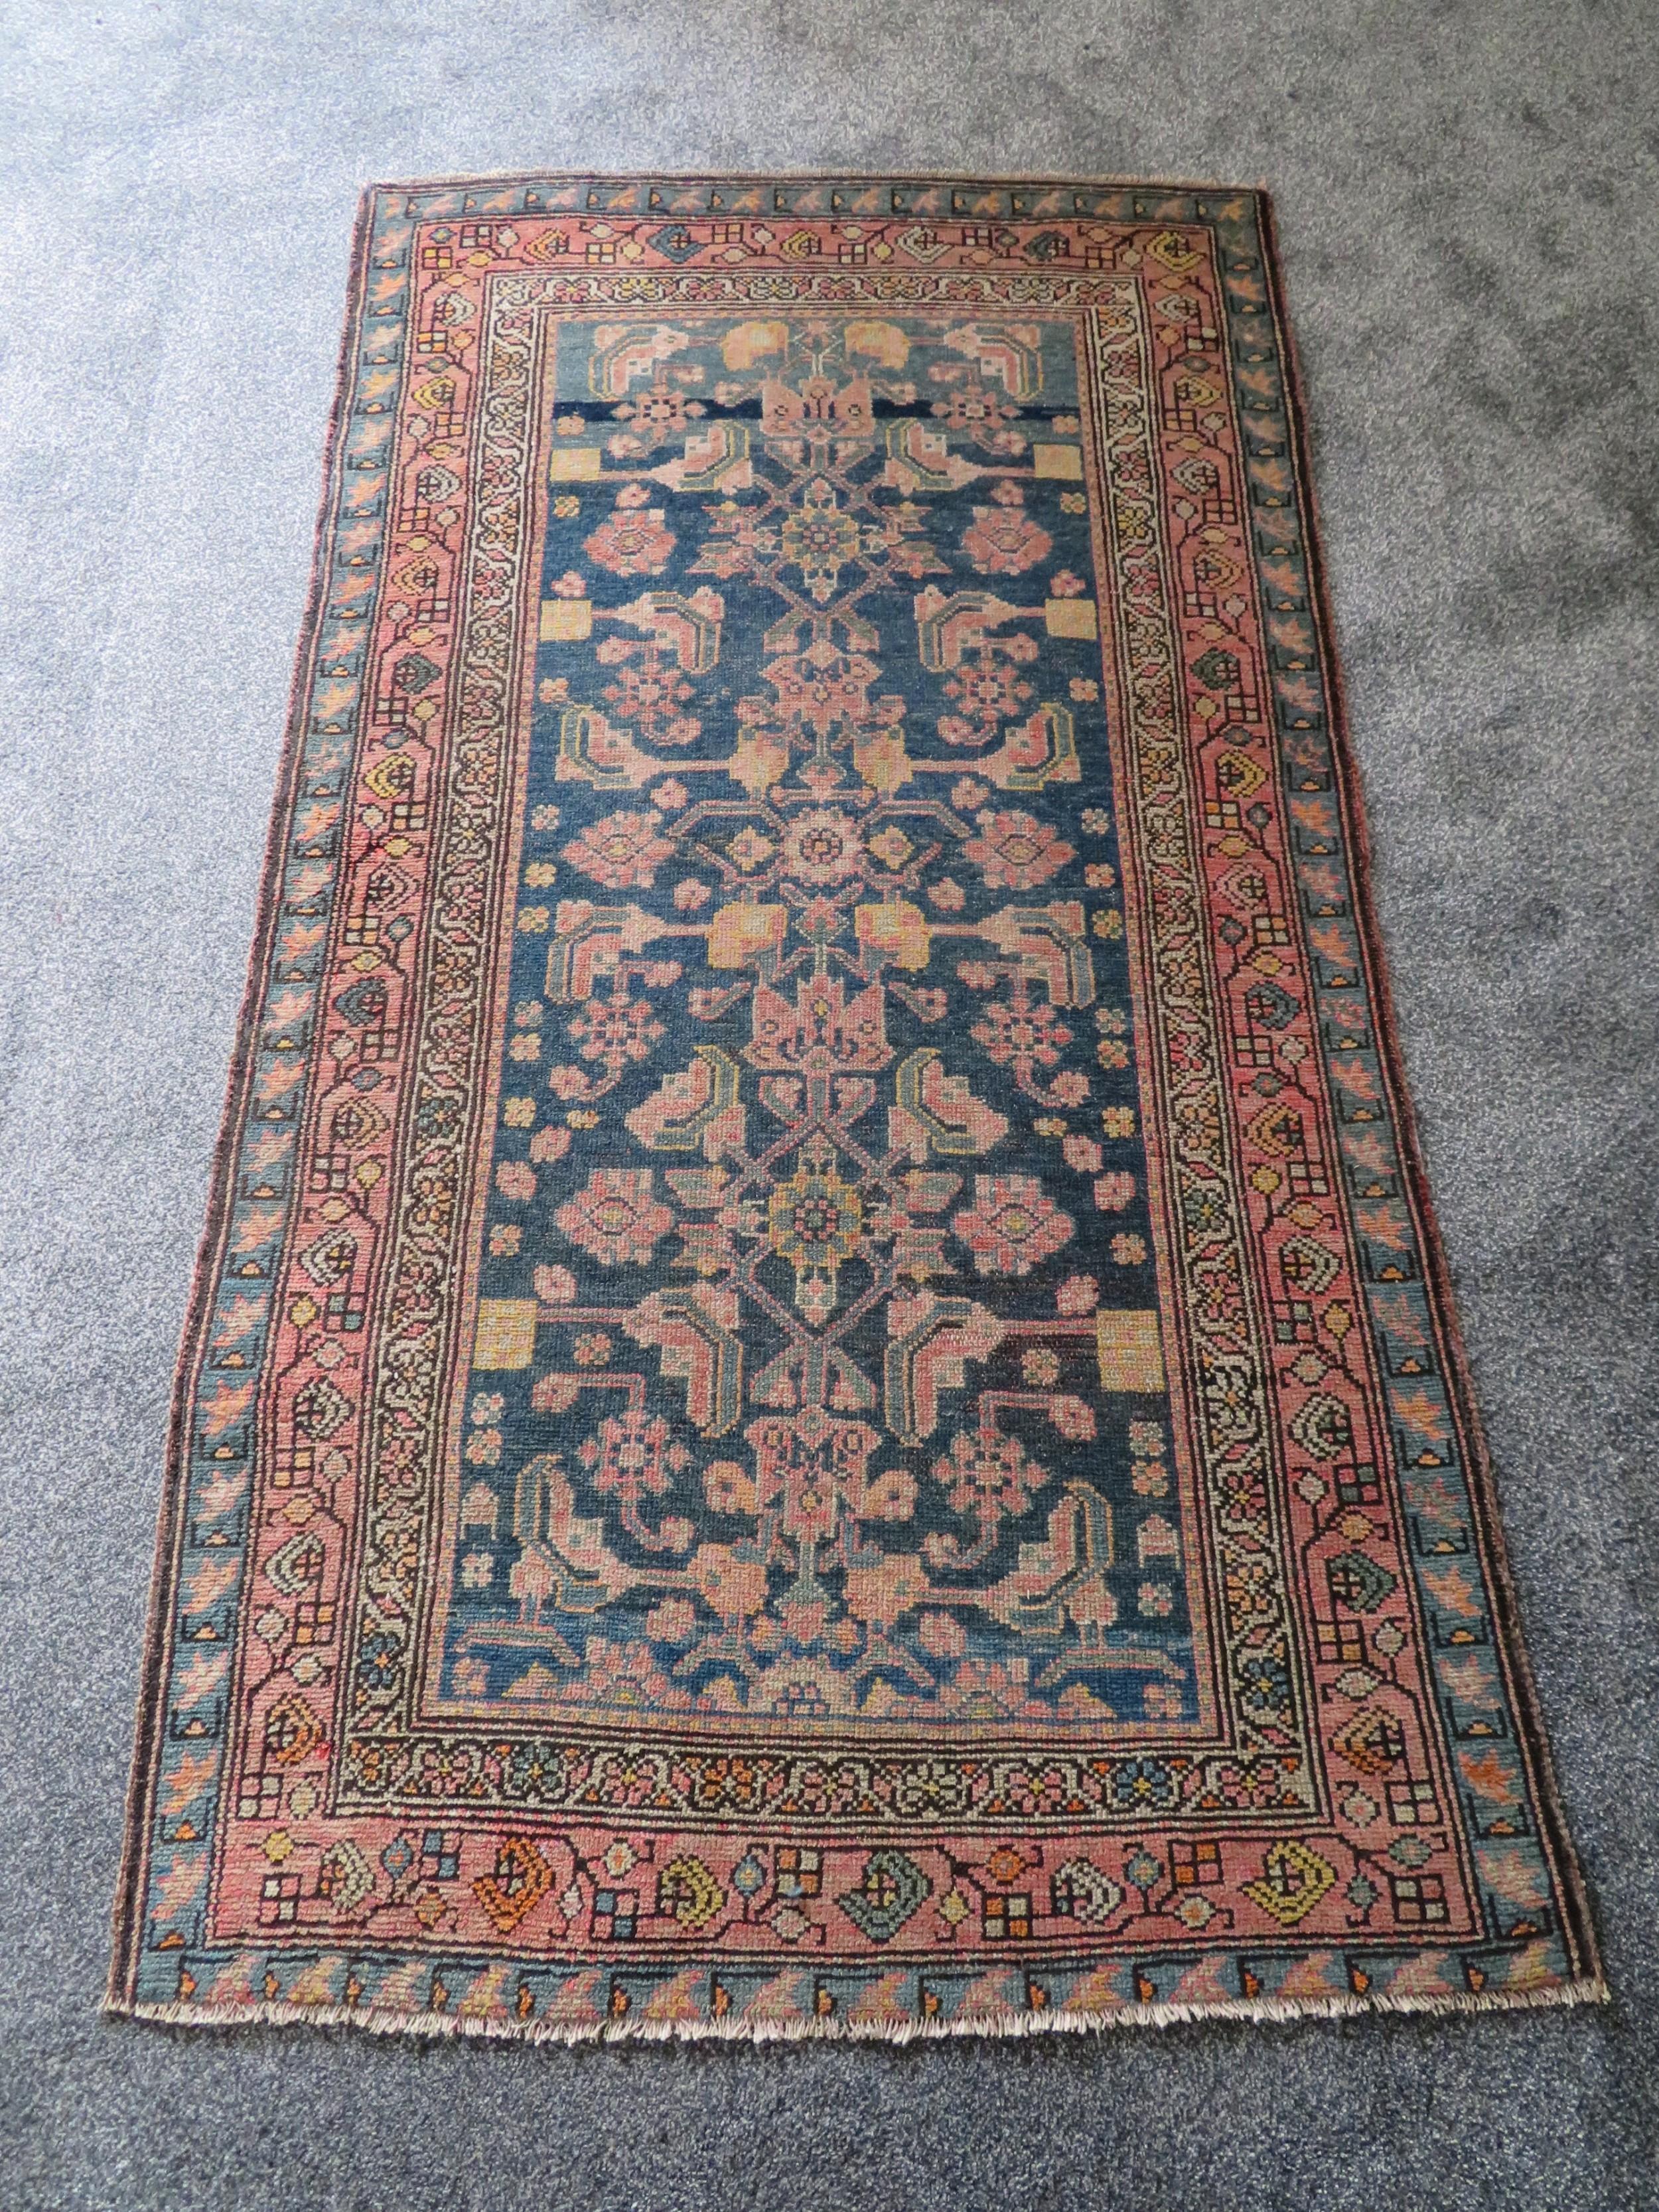 antique country house shabby chic persian hamadan rug subtle colours palette